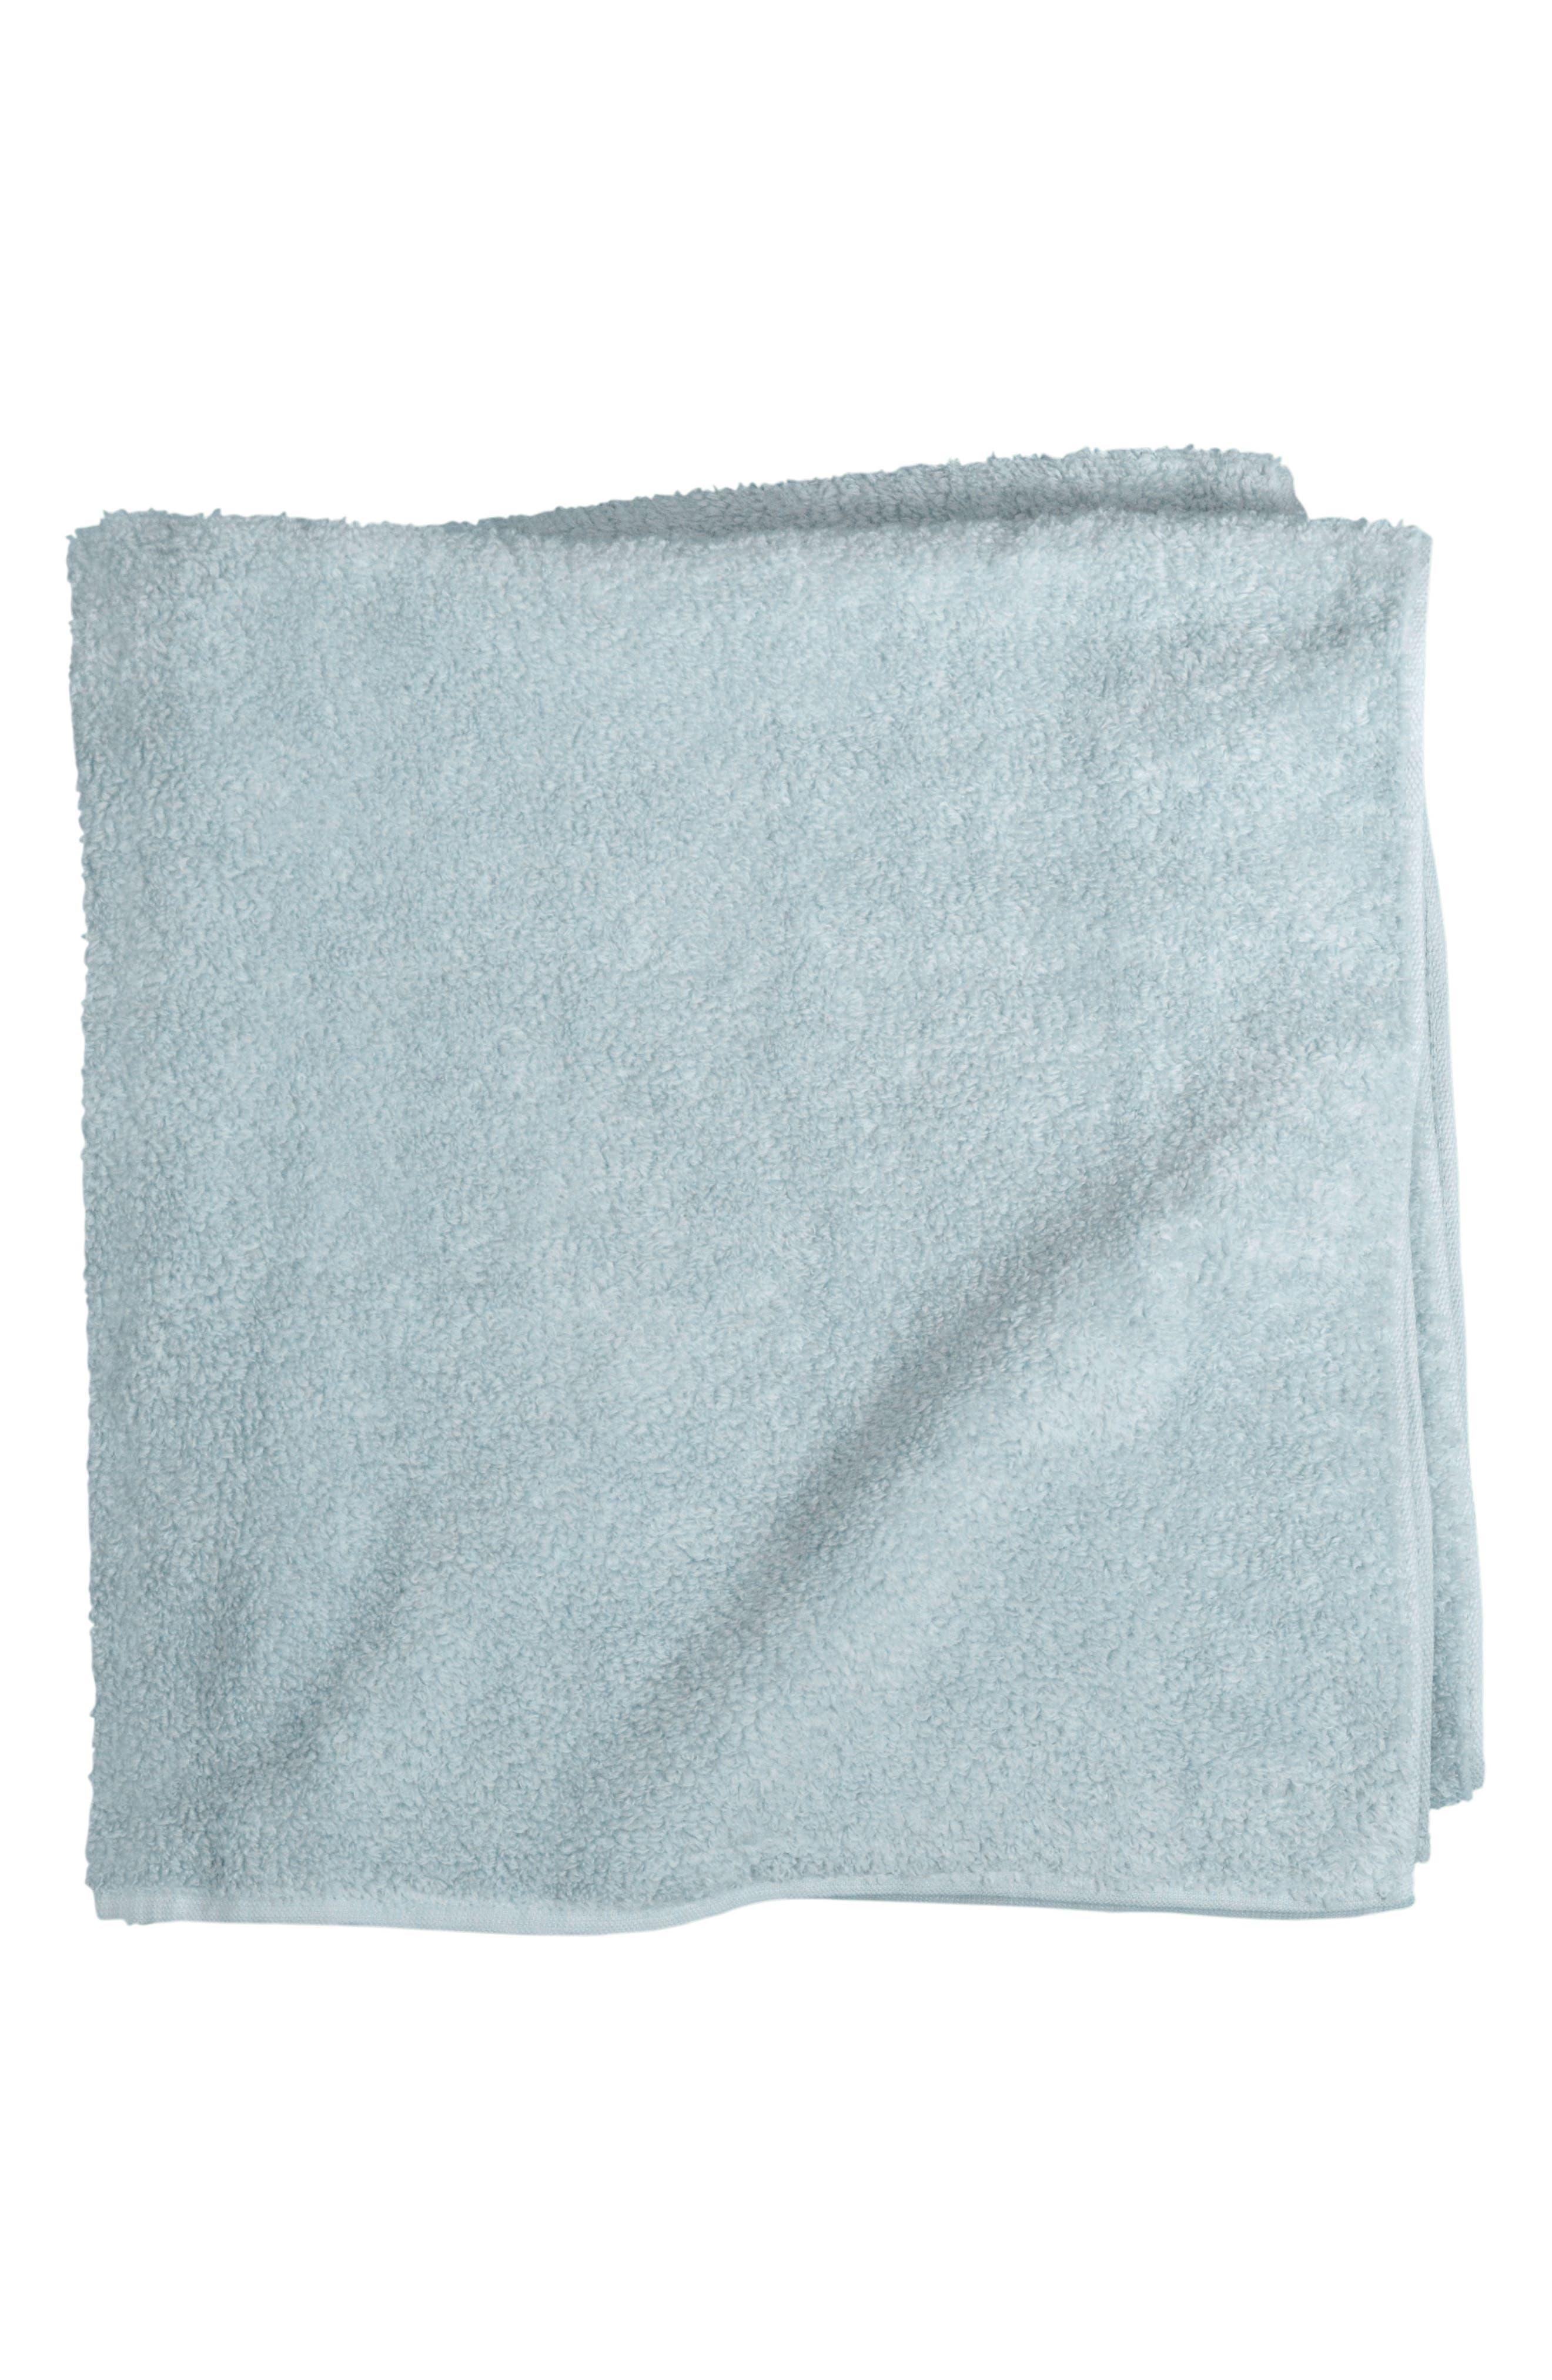 Alternate Image 1 Selected - Uchino Zero Twist Bath Towel